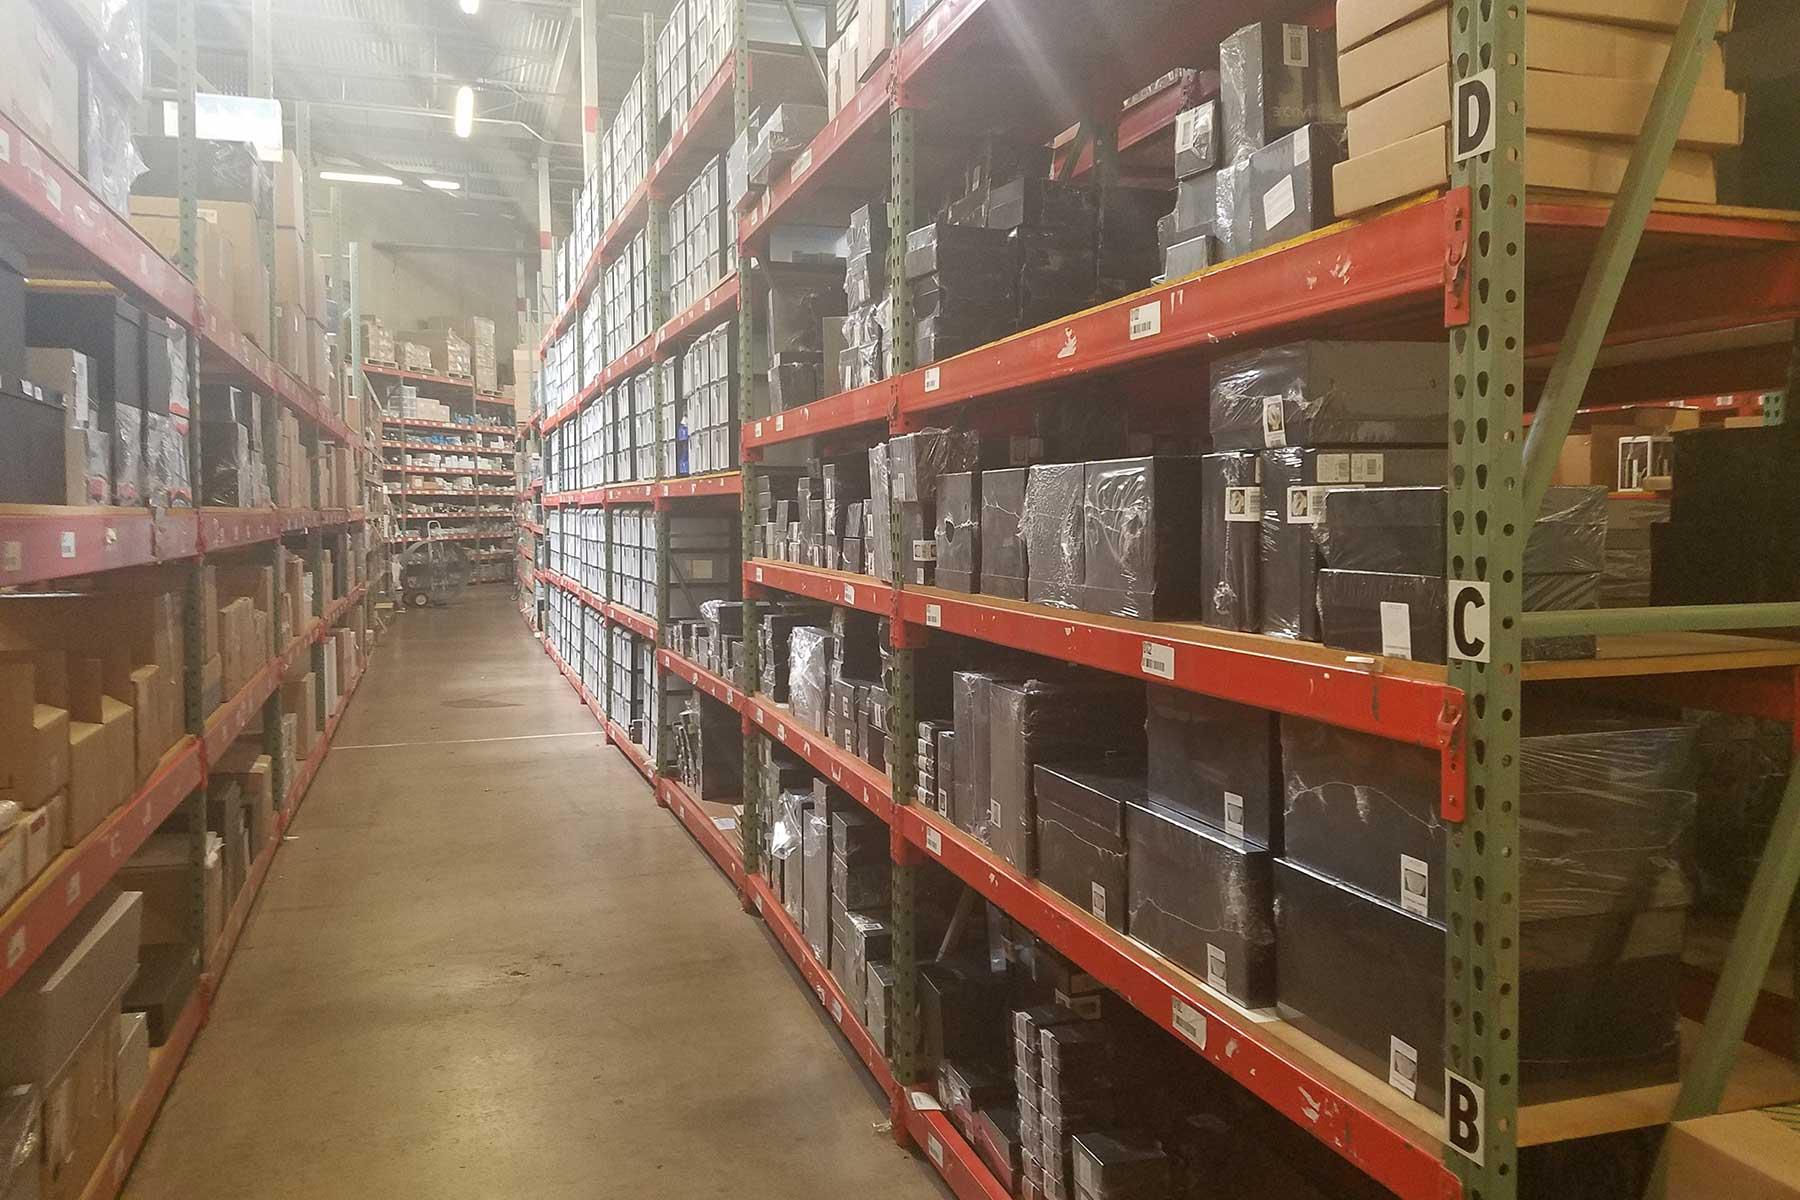 Our 25,000 square foot distribution center in Dallas, Texas